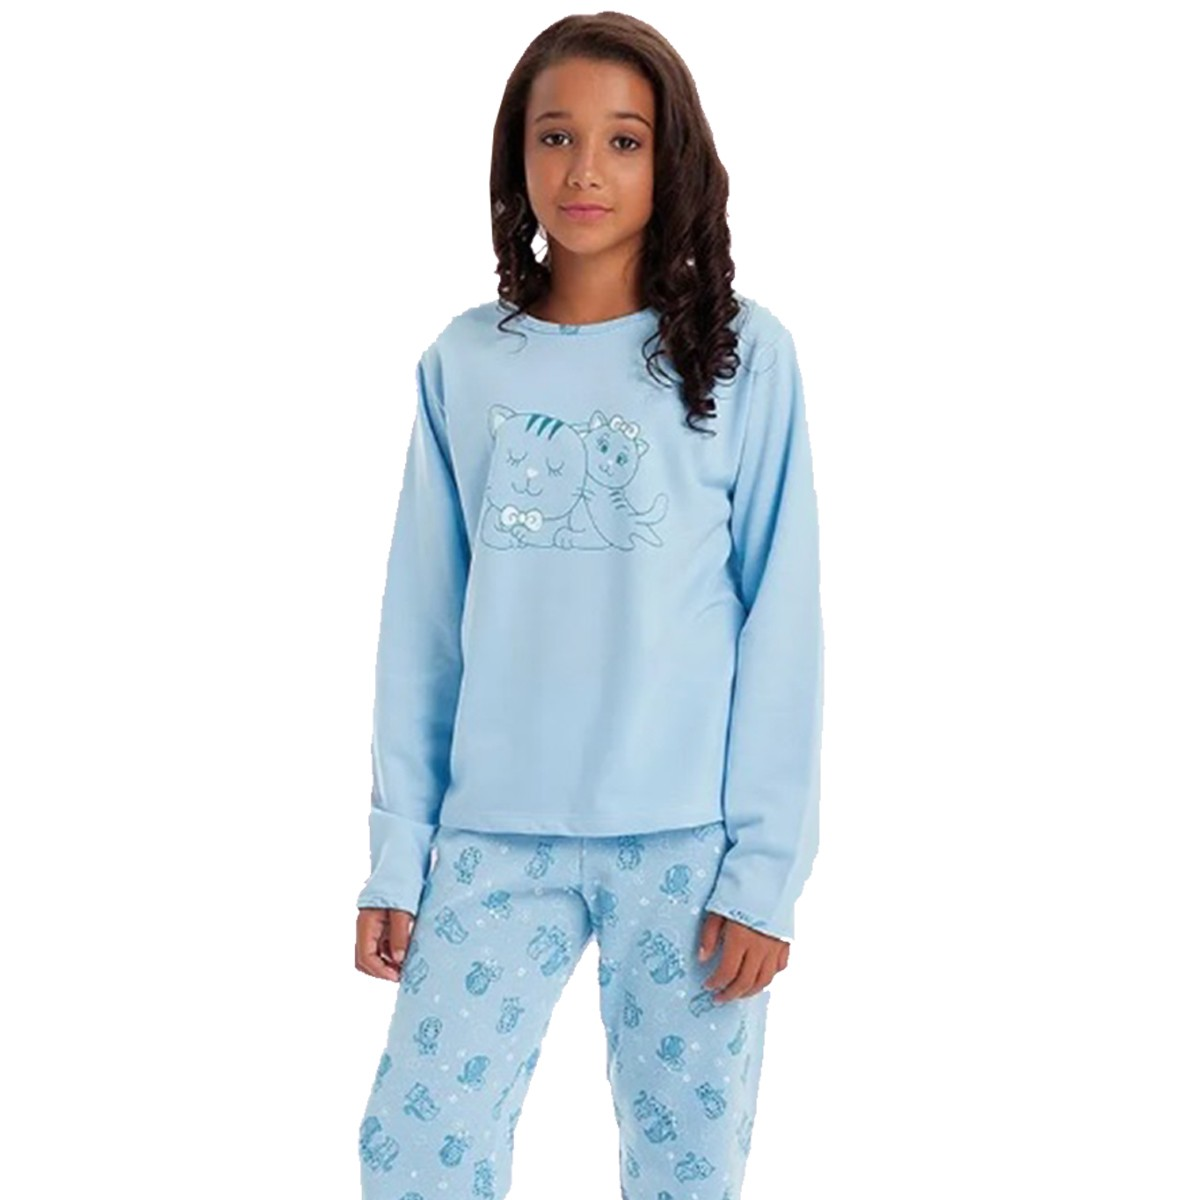 Pijama Longo Manga Longa Calça Flanelado Moletinho Feminino Infantil Menina Ref: 1356